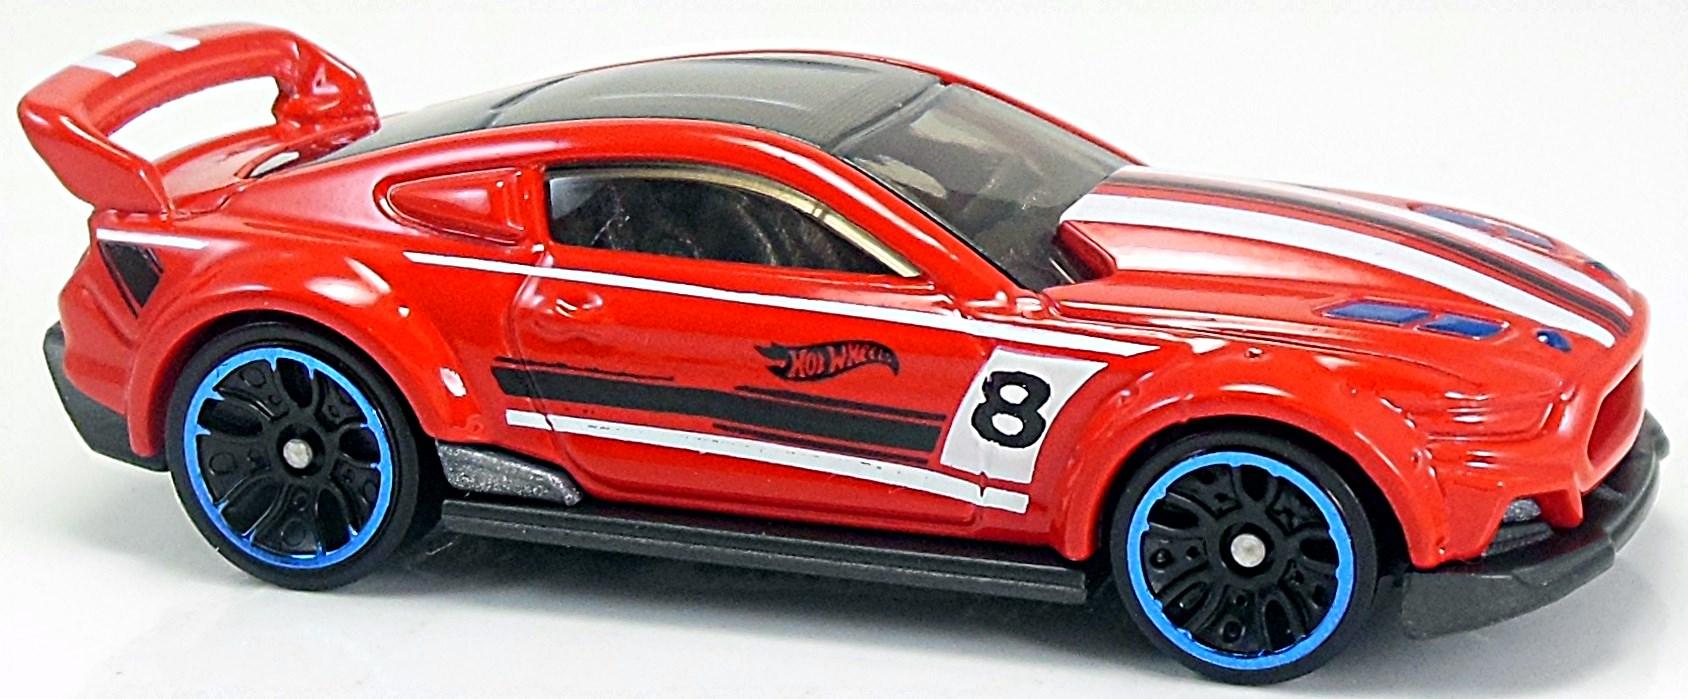 2015 Mustang Custom Wheels >> Custom 15 Ford Mustang 74mm 2015 Hot Wheels Newsletter